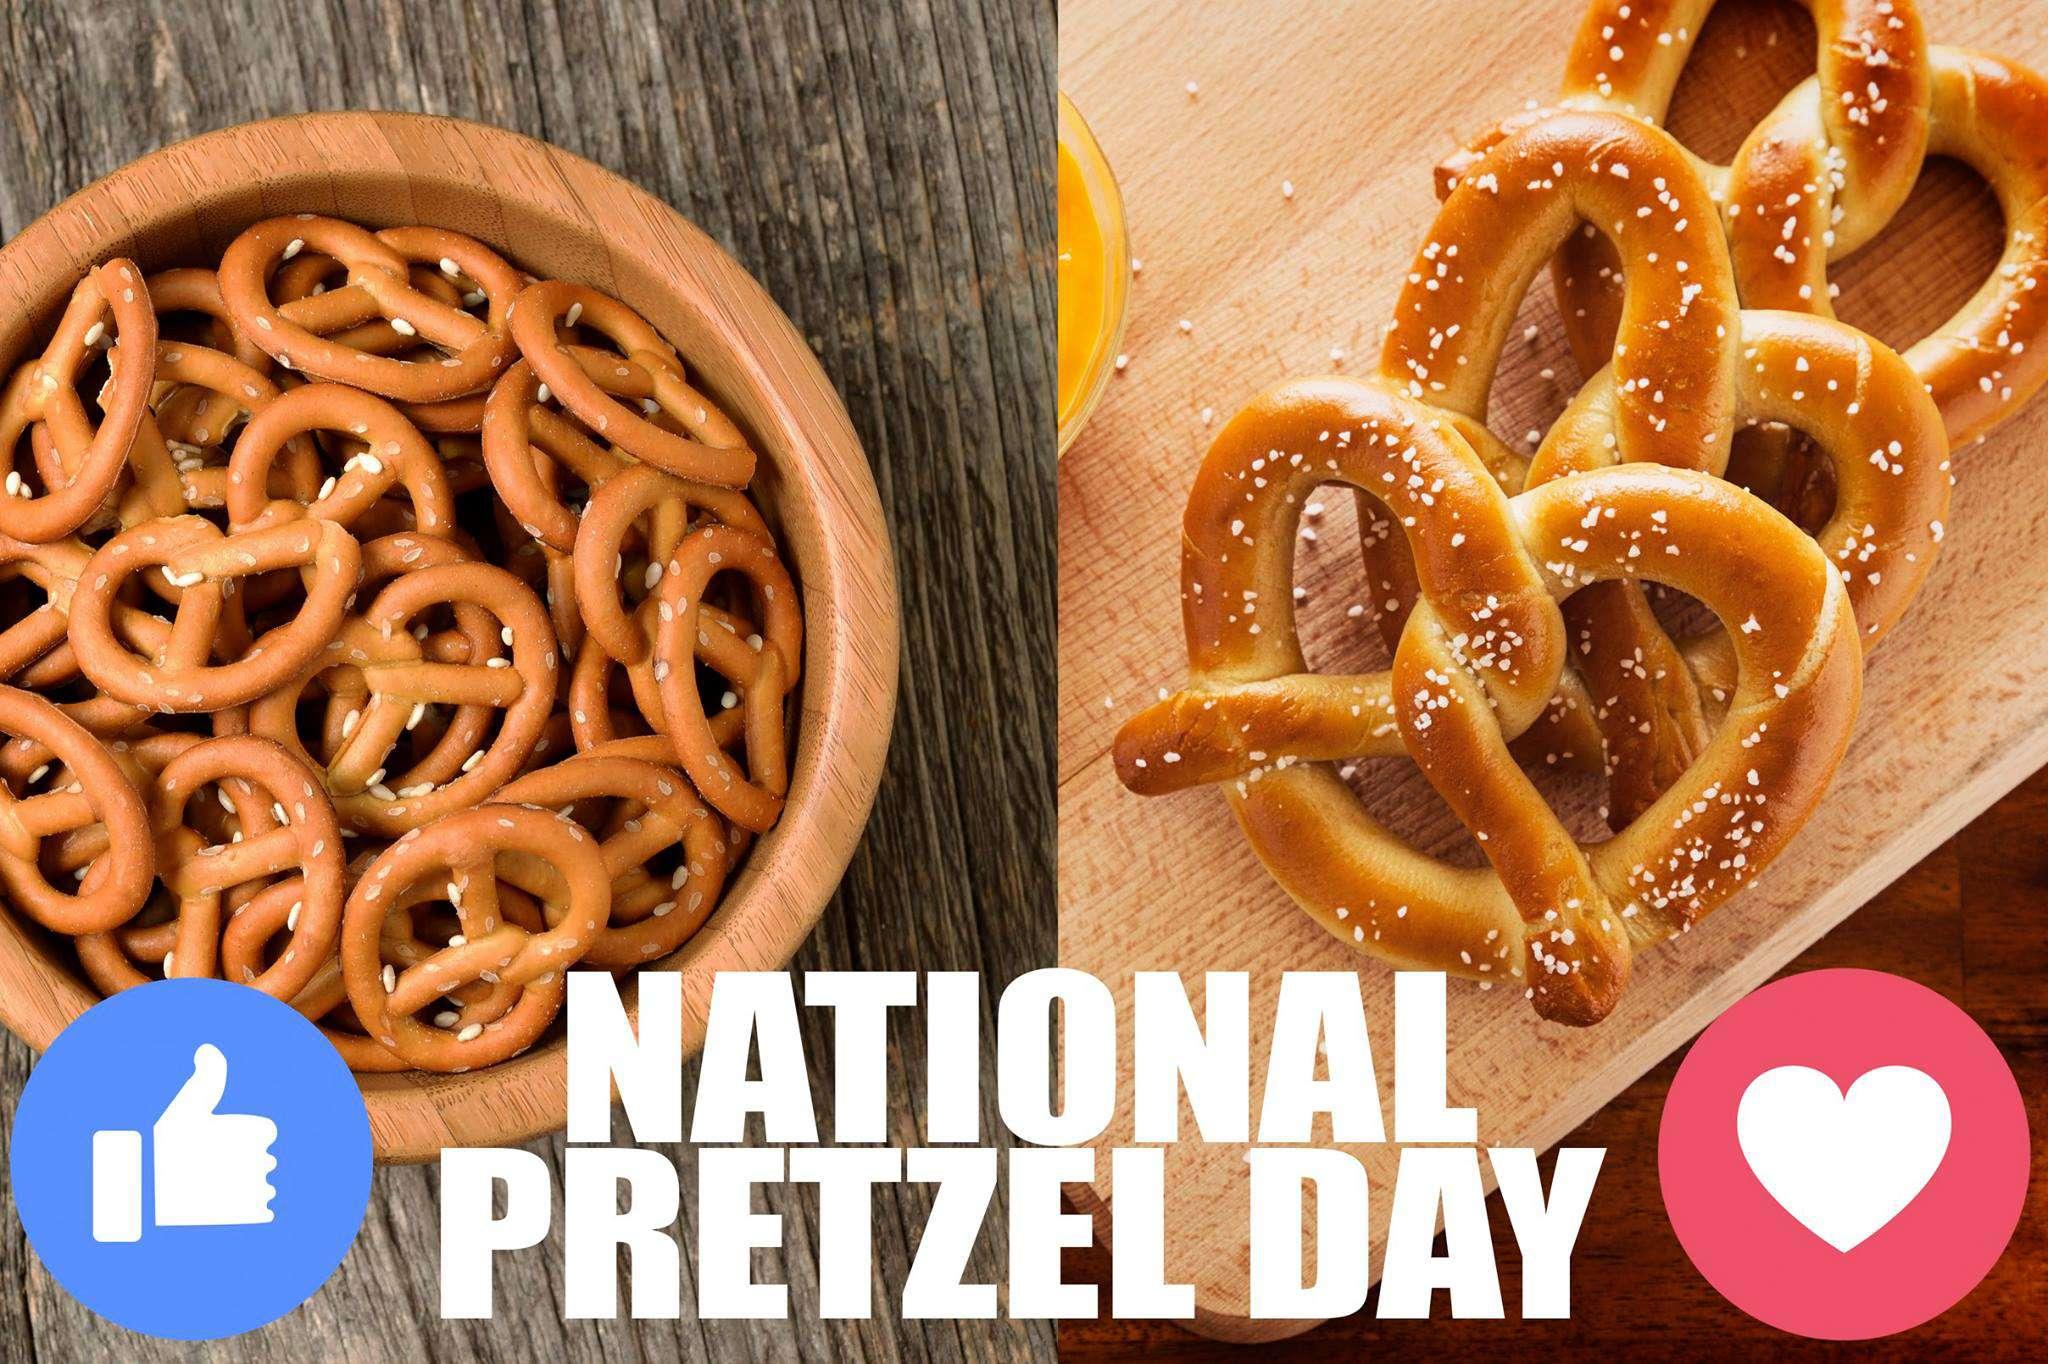 National Pretzel Day Wishes for Whatsapp